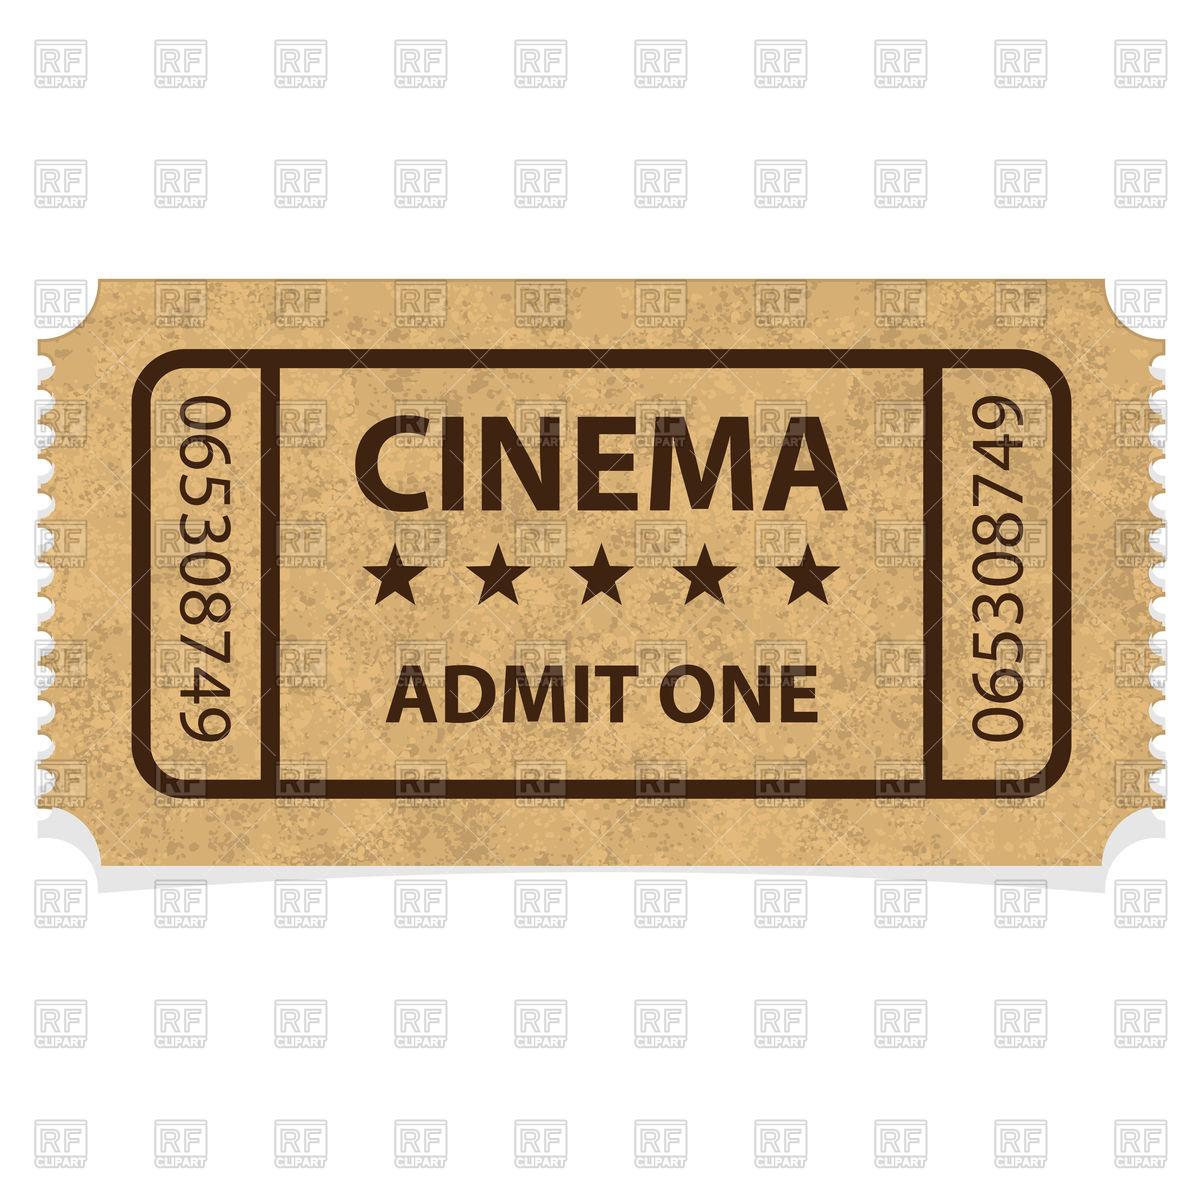 1200x1200 Retro Cinema Ticket Free Vector Image Vector Artwork Of Objects